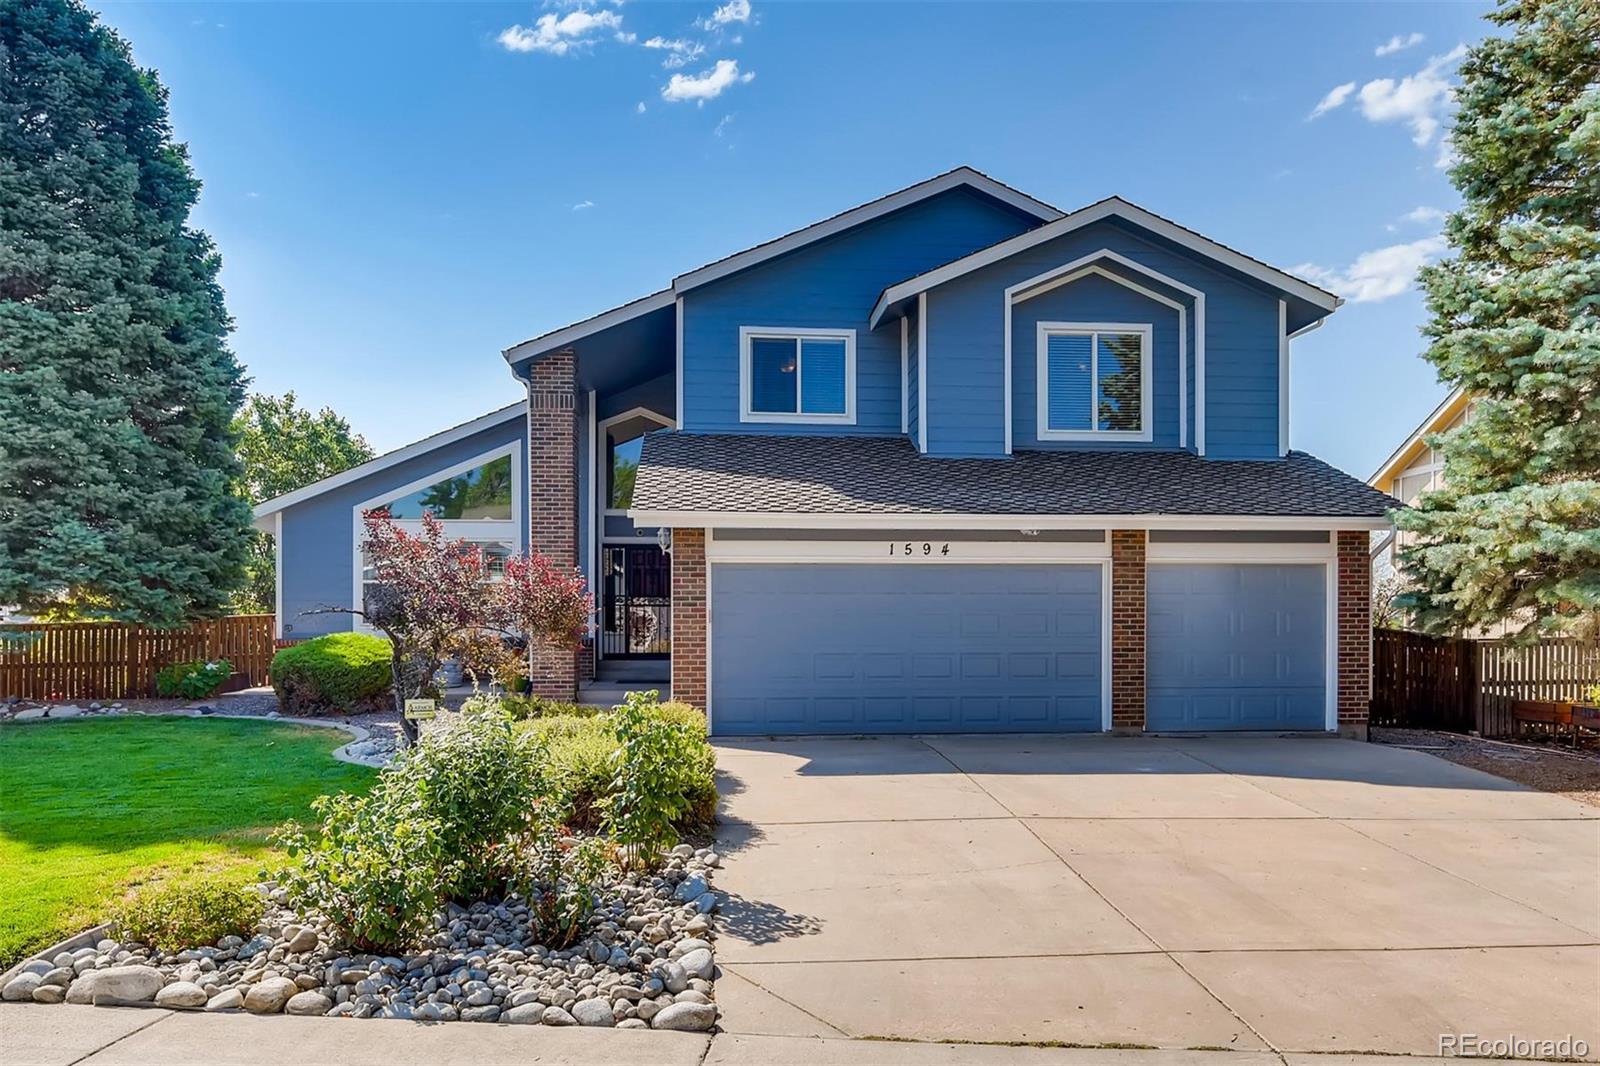 MLS# 2832026 - 1 - 1594 Arrowhead Road, Highlands Ranch, CO 80126